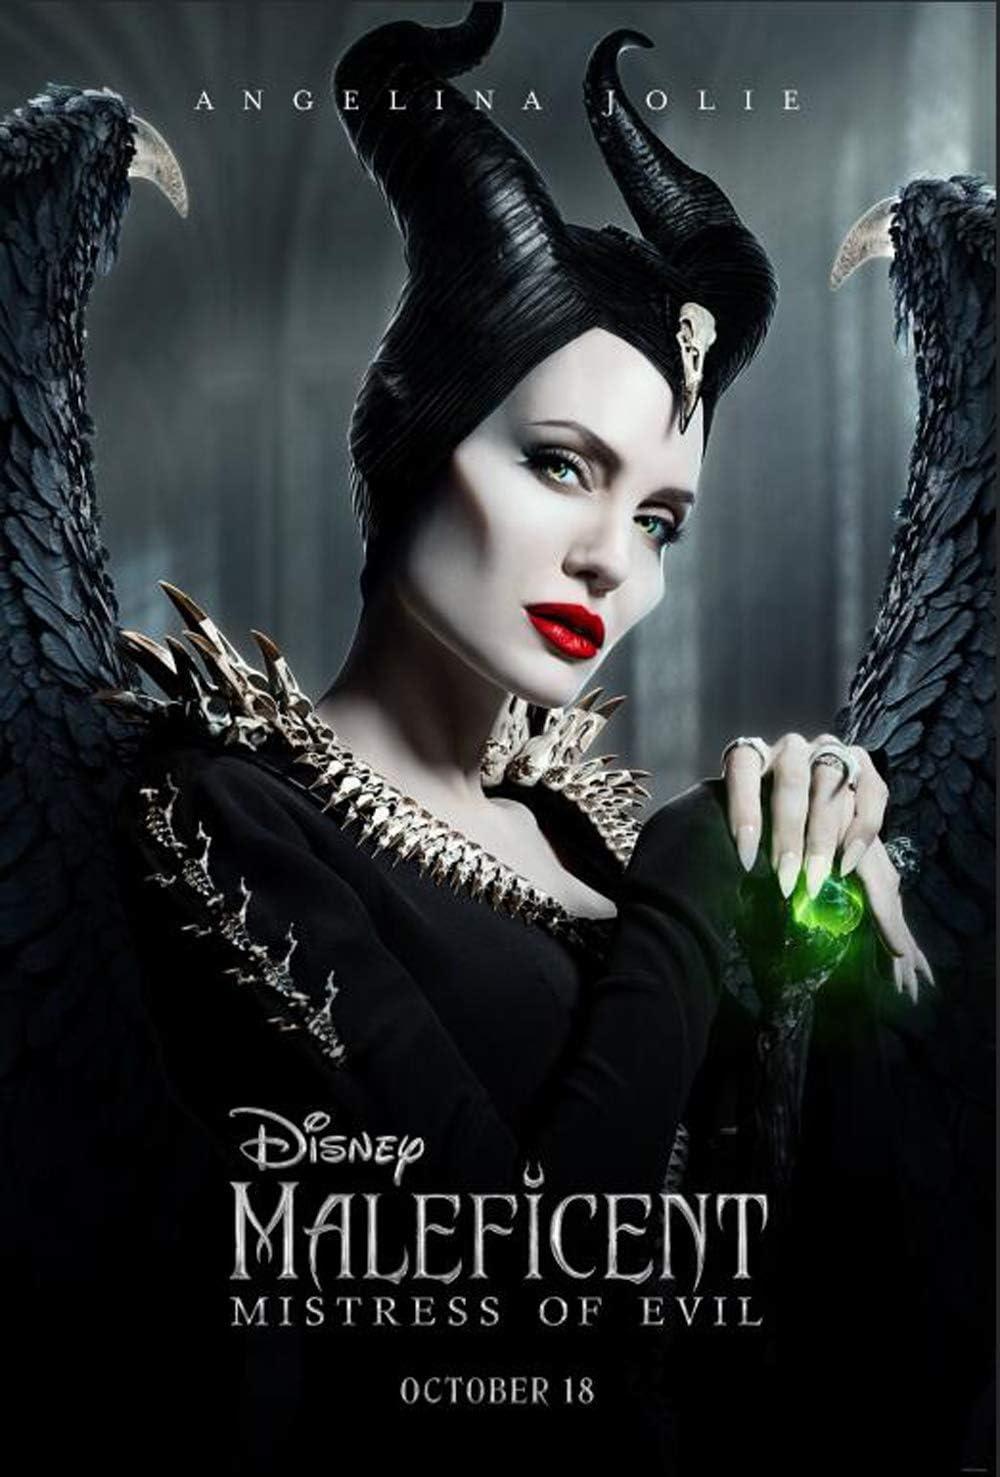 Amazon Com Tomorrow Sunny Maleficent Mistress Of Evil 2019 Movie Poster Joachim Ronning Angelina Jolie Art Print 24 X36 A Posters Prints